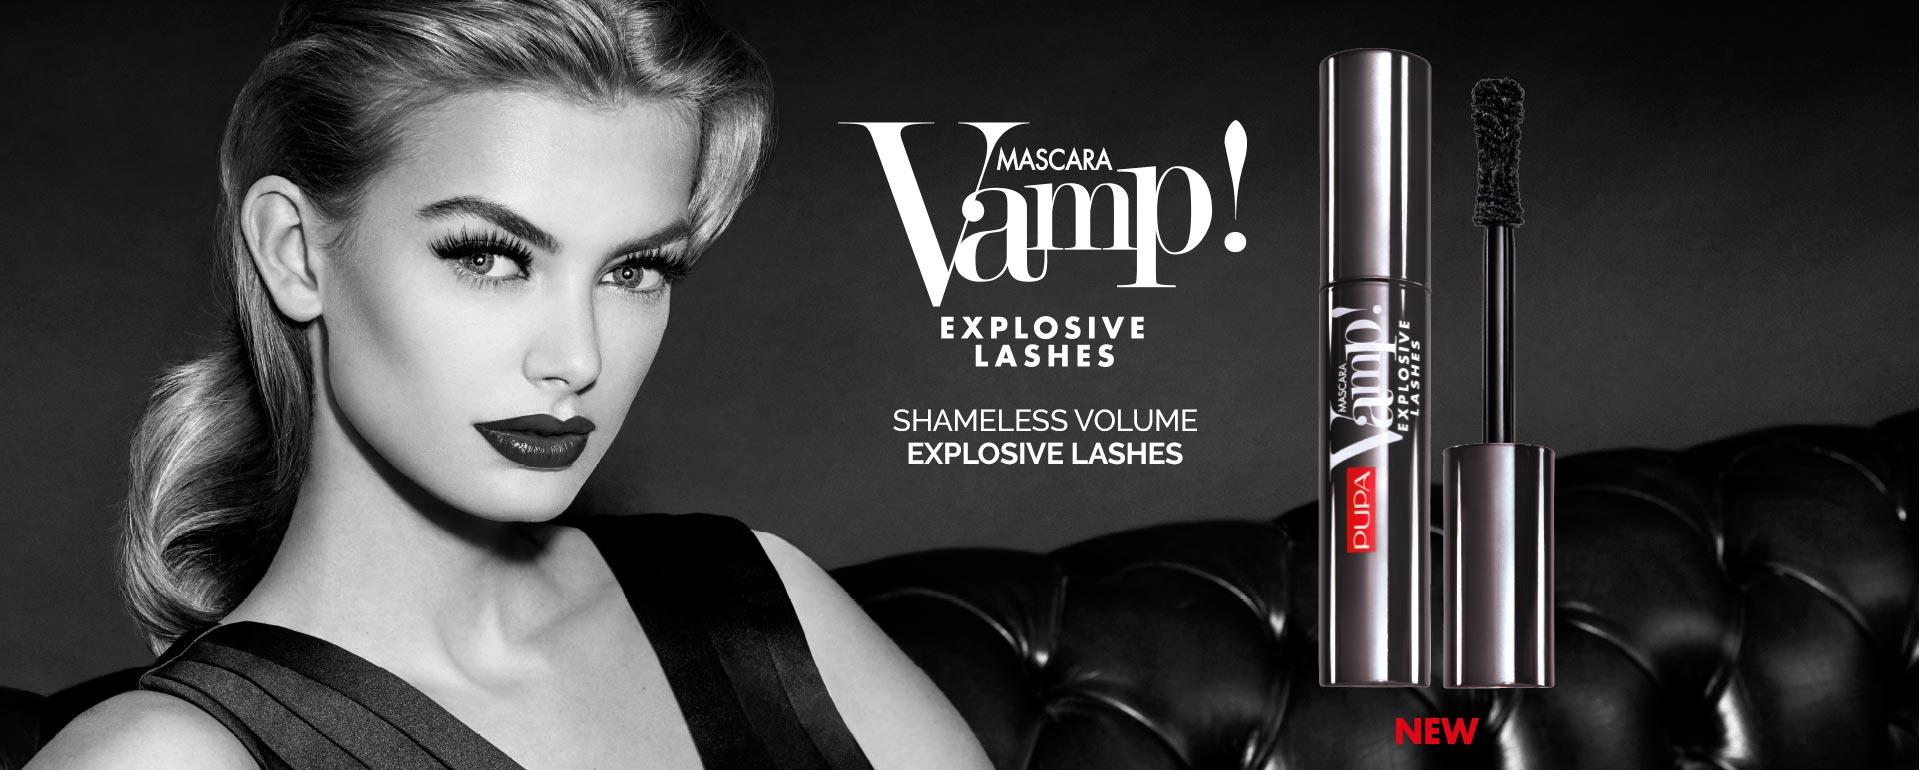 Pupa Mascara Vamp Explosive Lashes